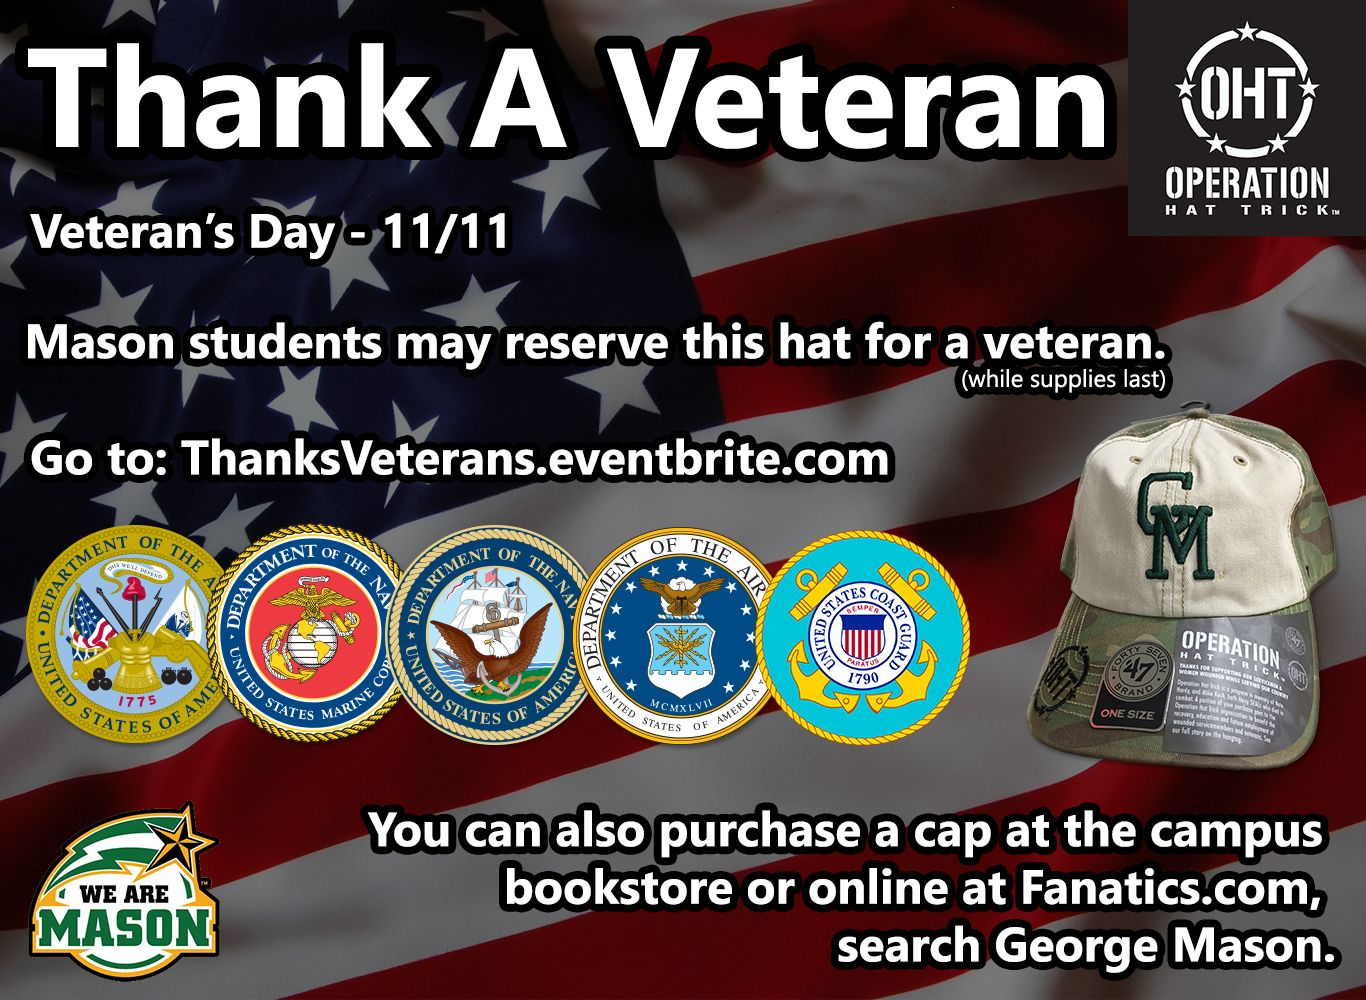 Thank a Veteran!  Visit ThanksVeterans.eventbrite.com to claim a cap!